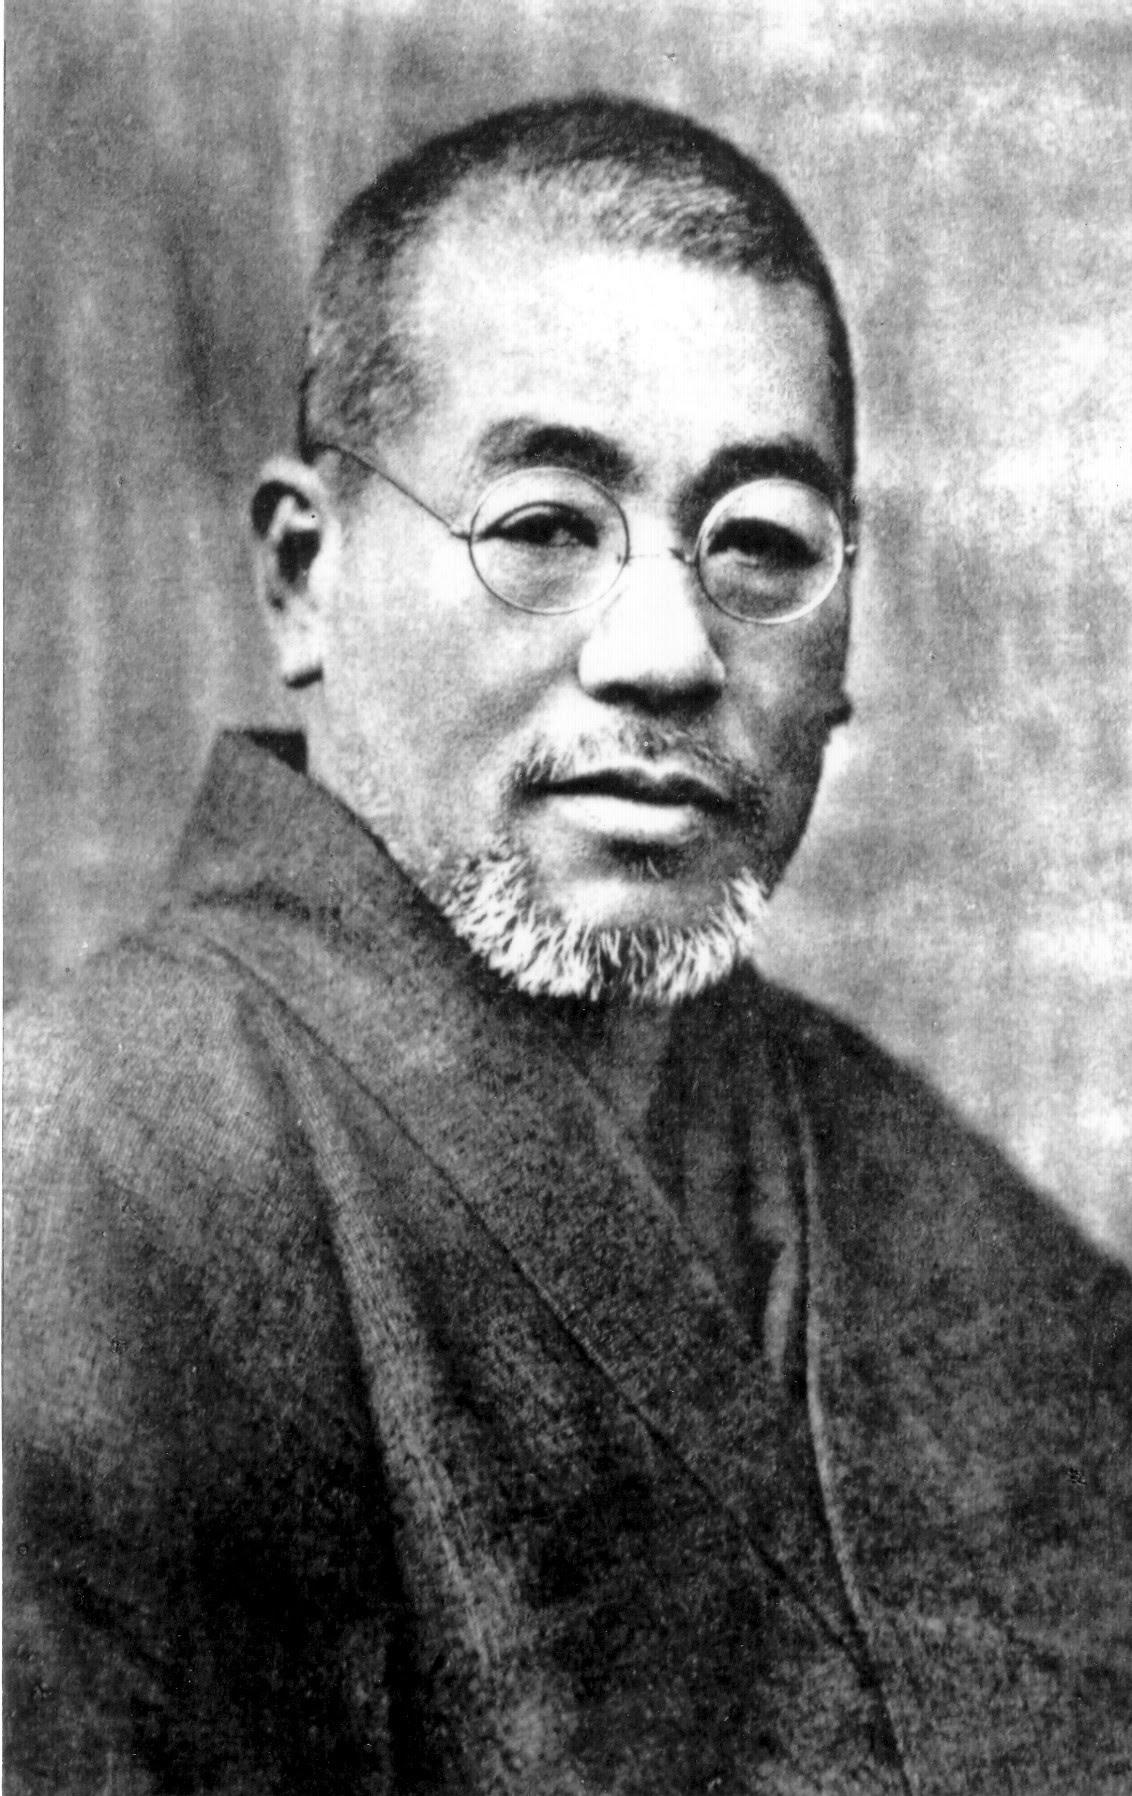 Maître Usui